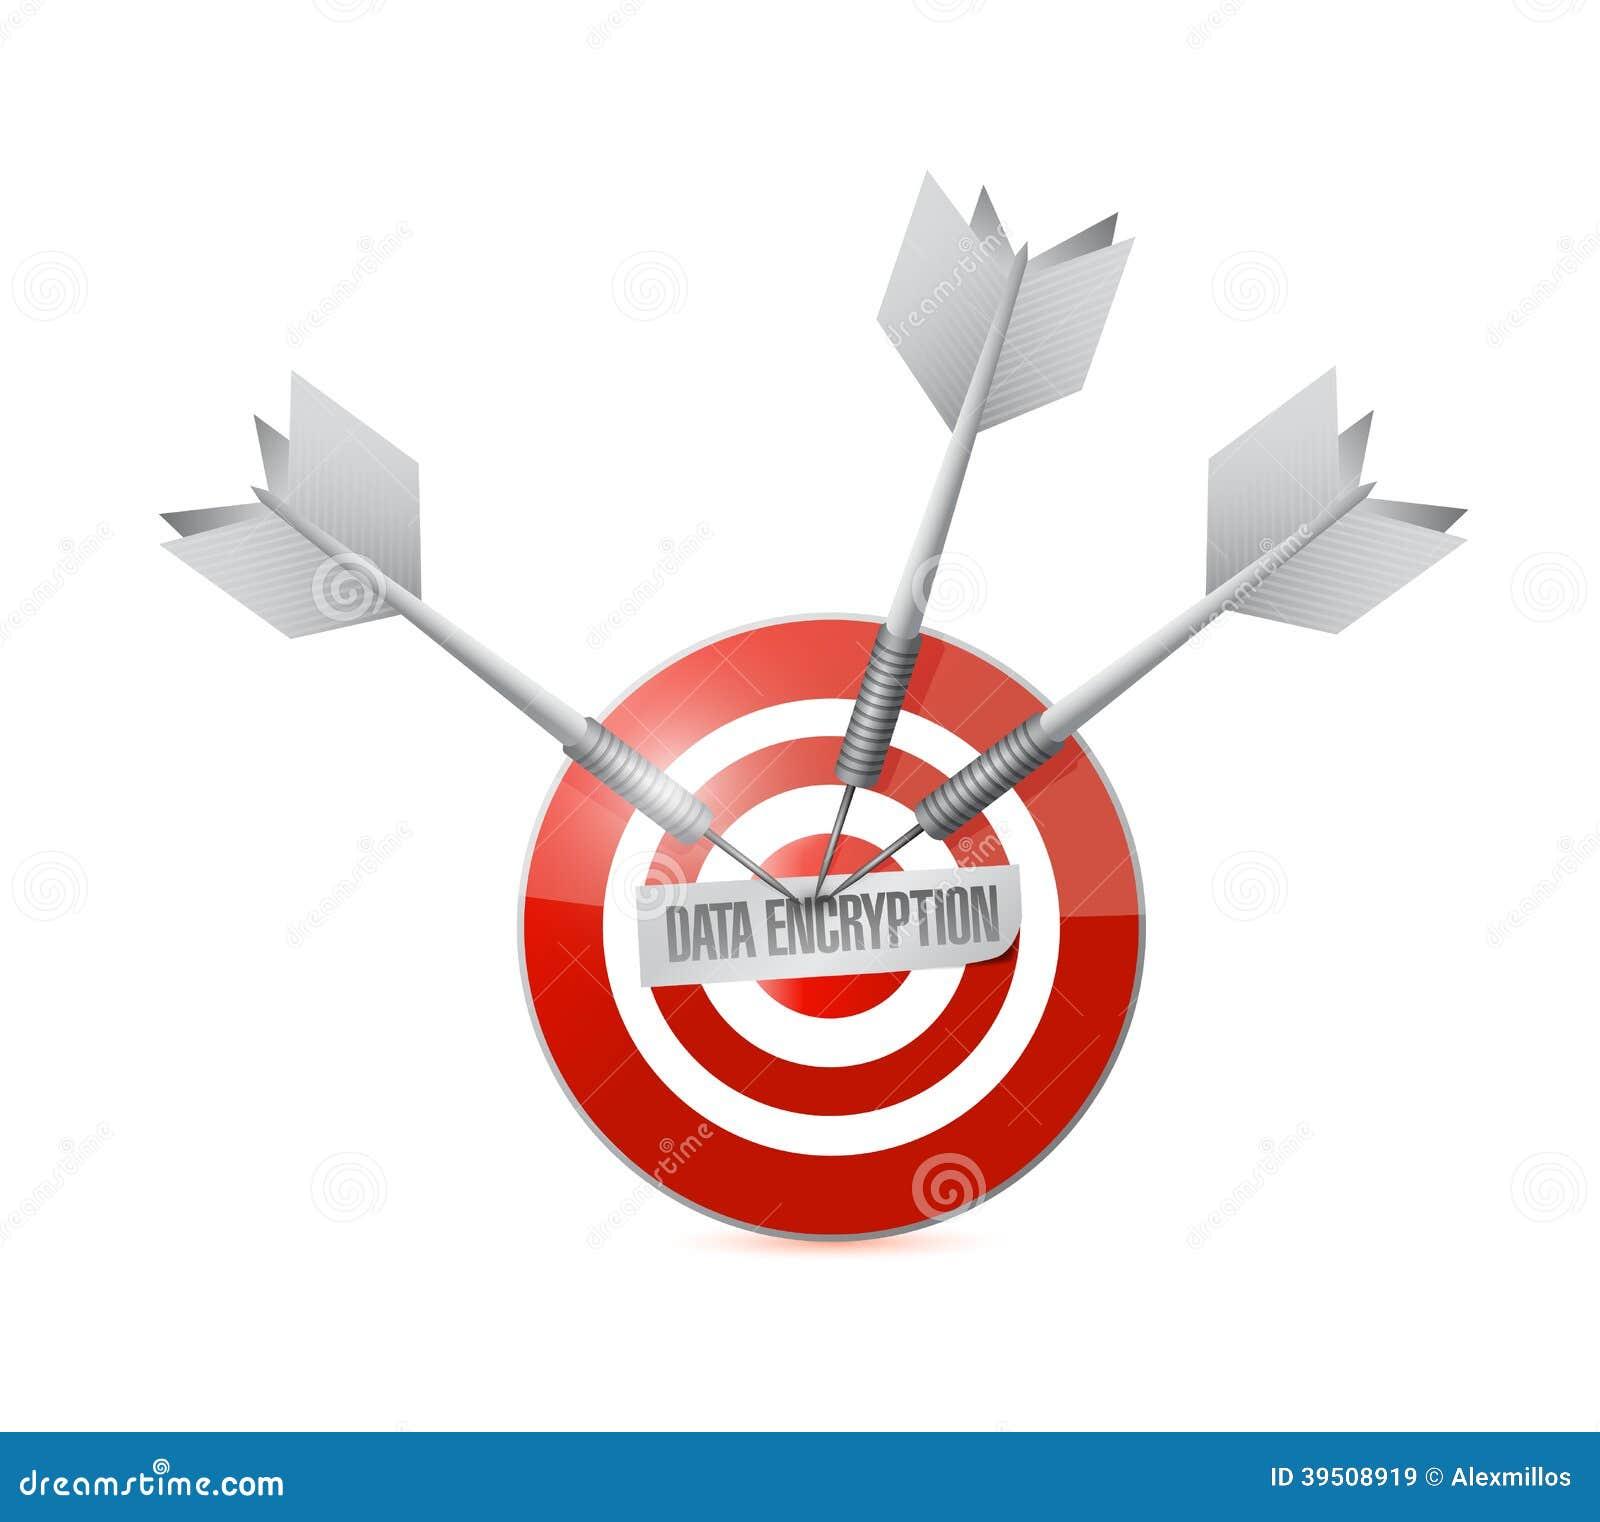 Data encryption target illustration design